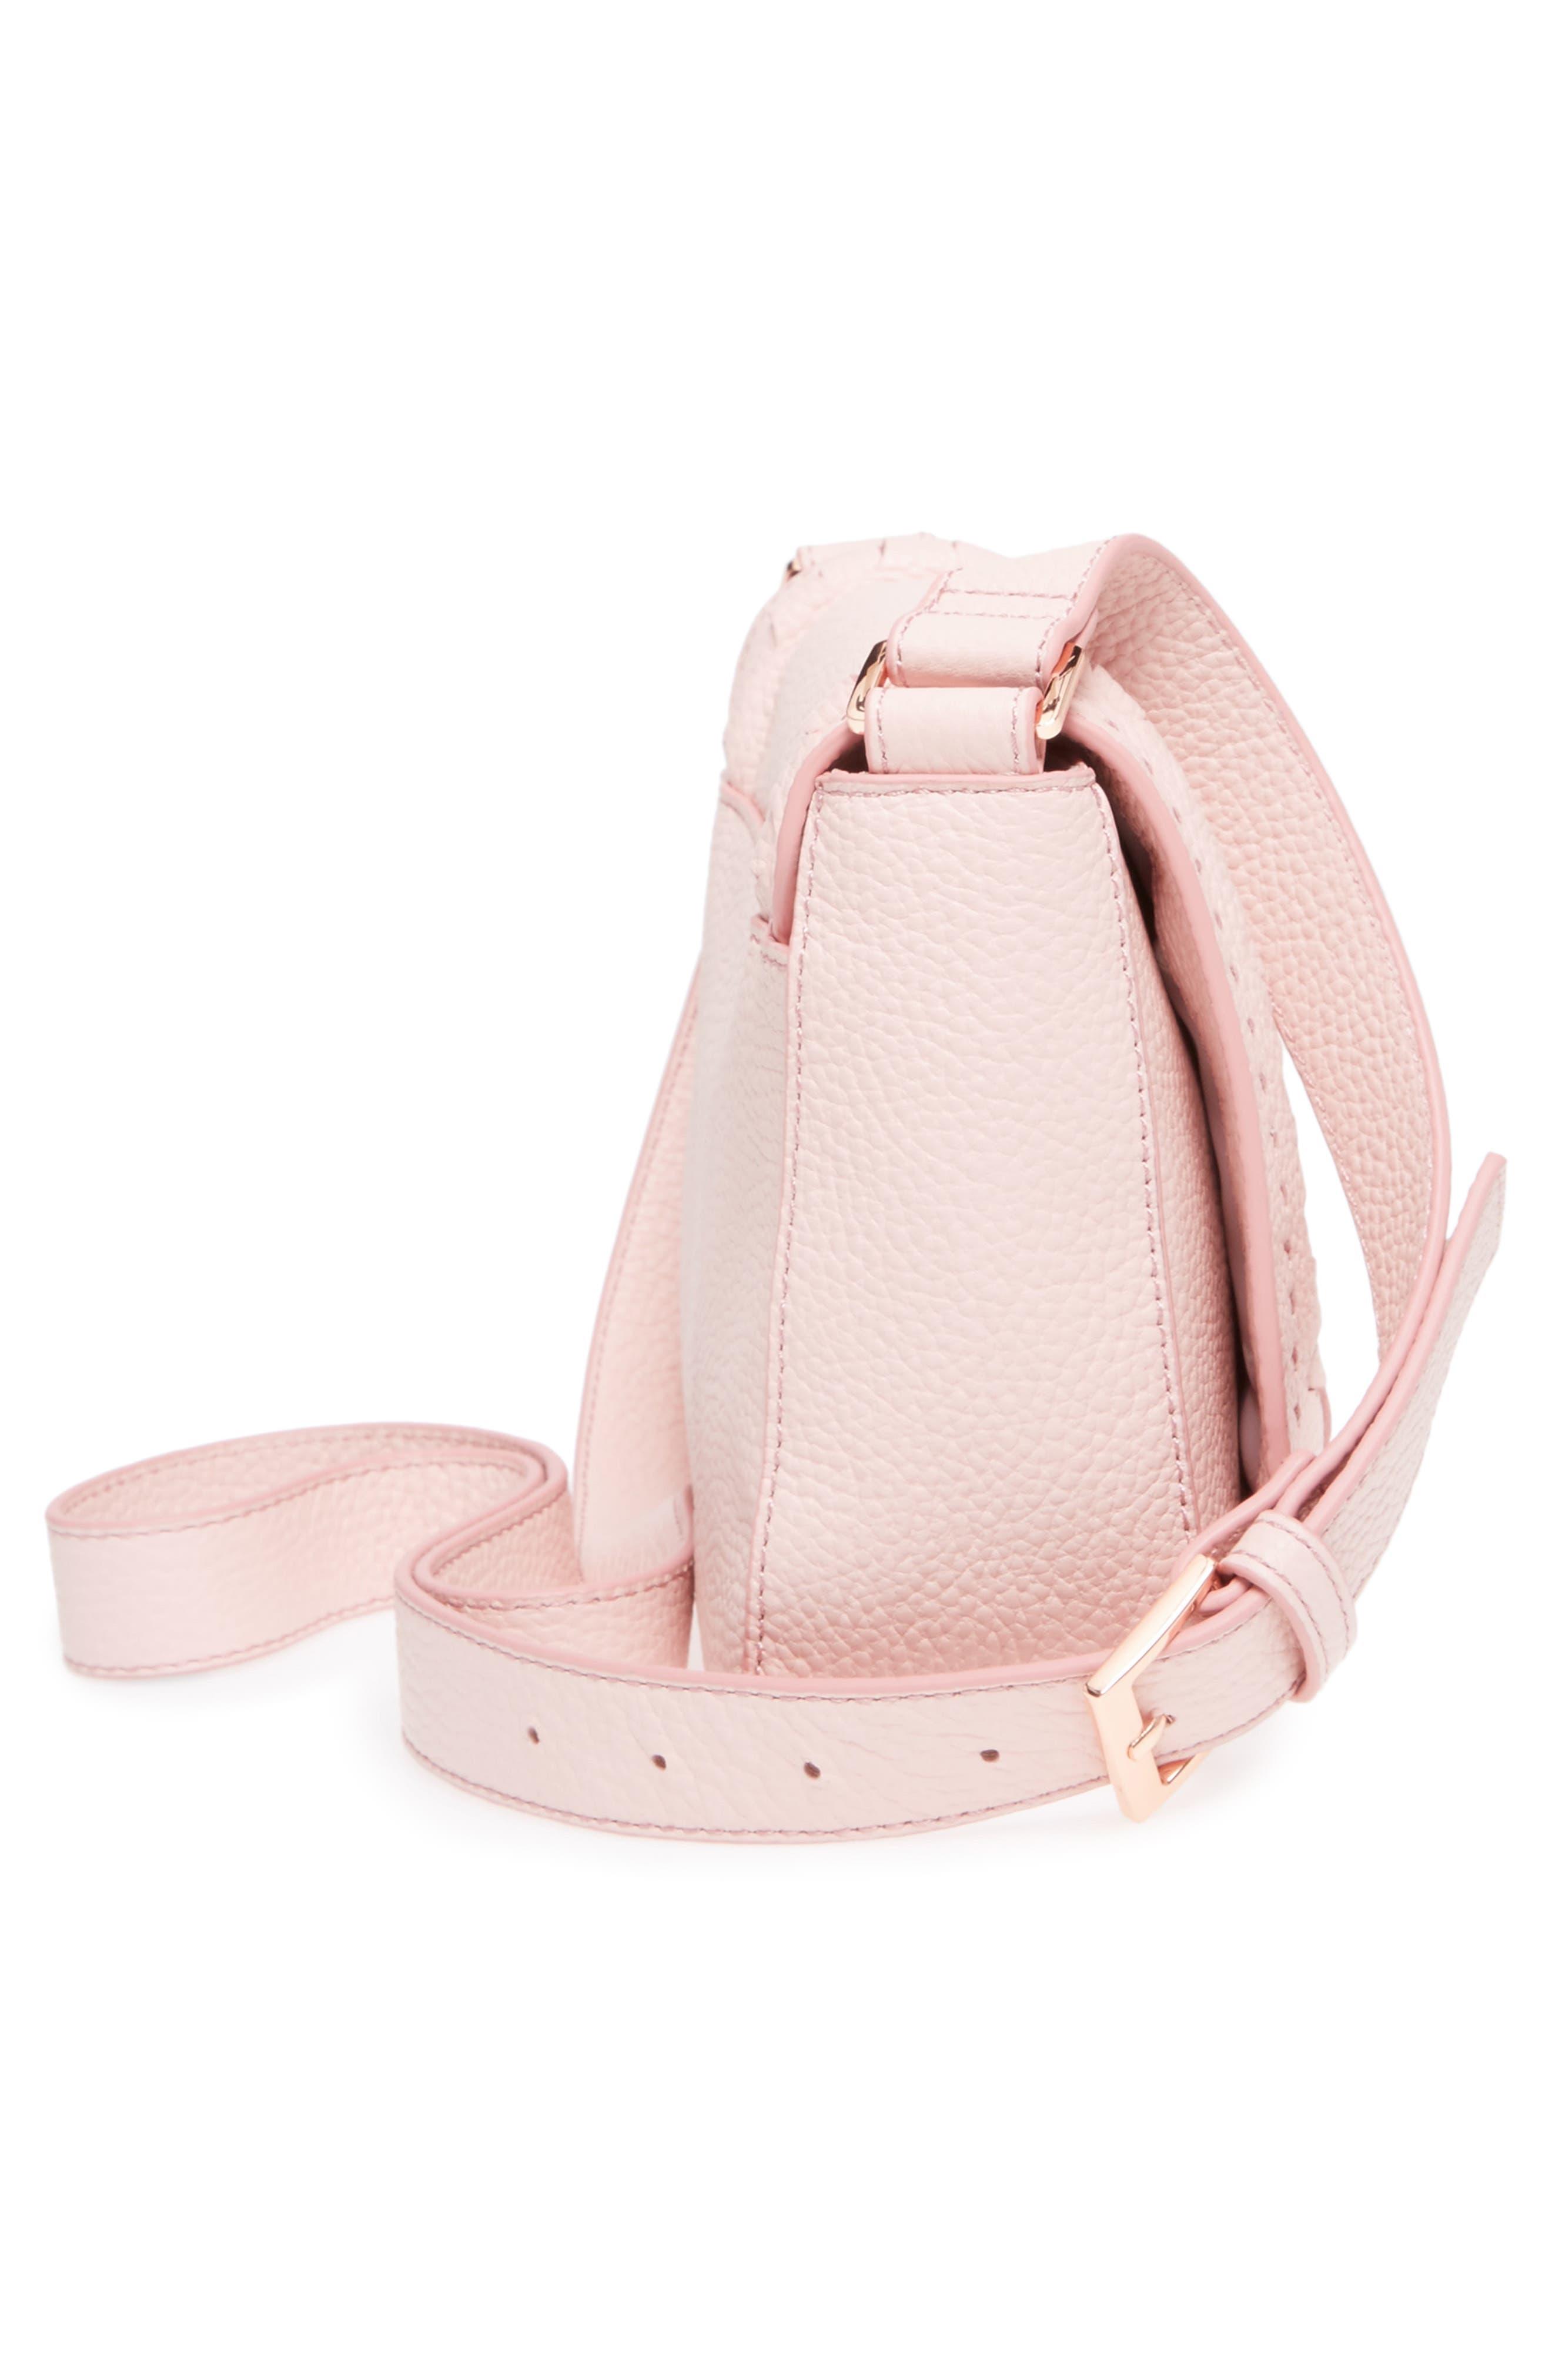 Tippi Leather Crossbody Bag,                             Alternate thumbnail 15, color,